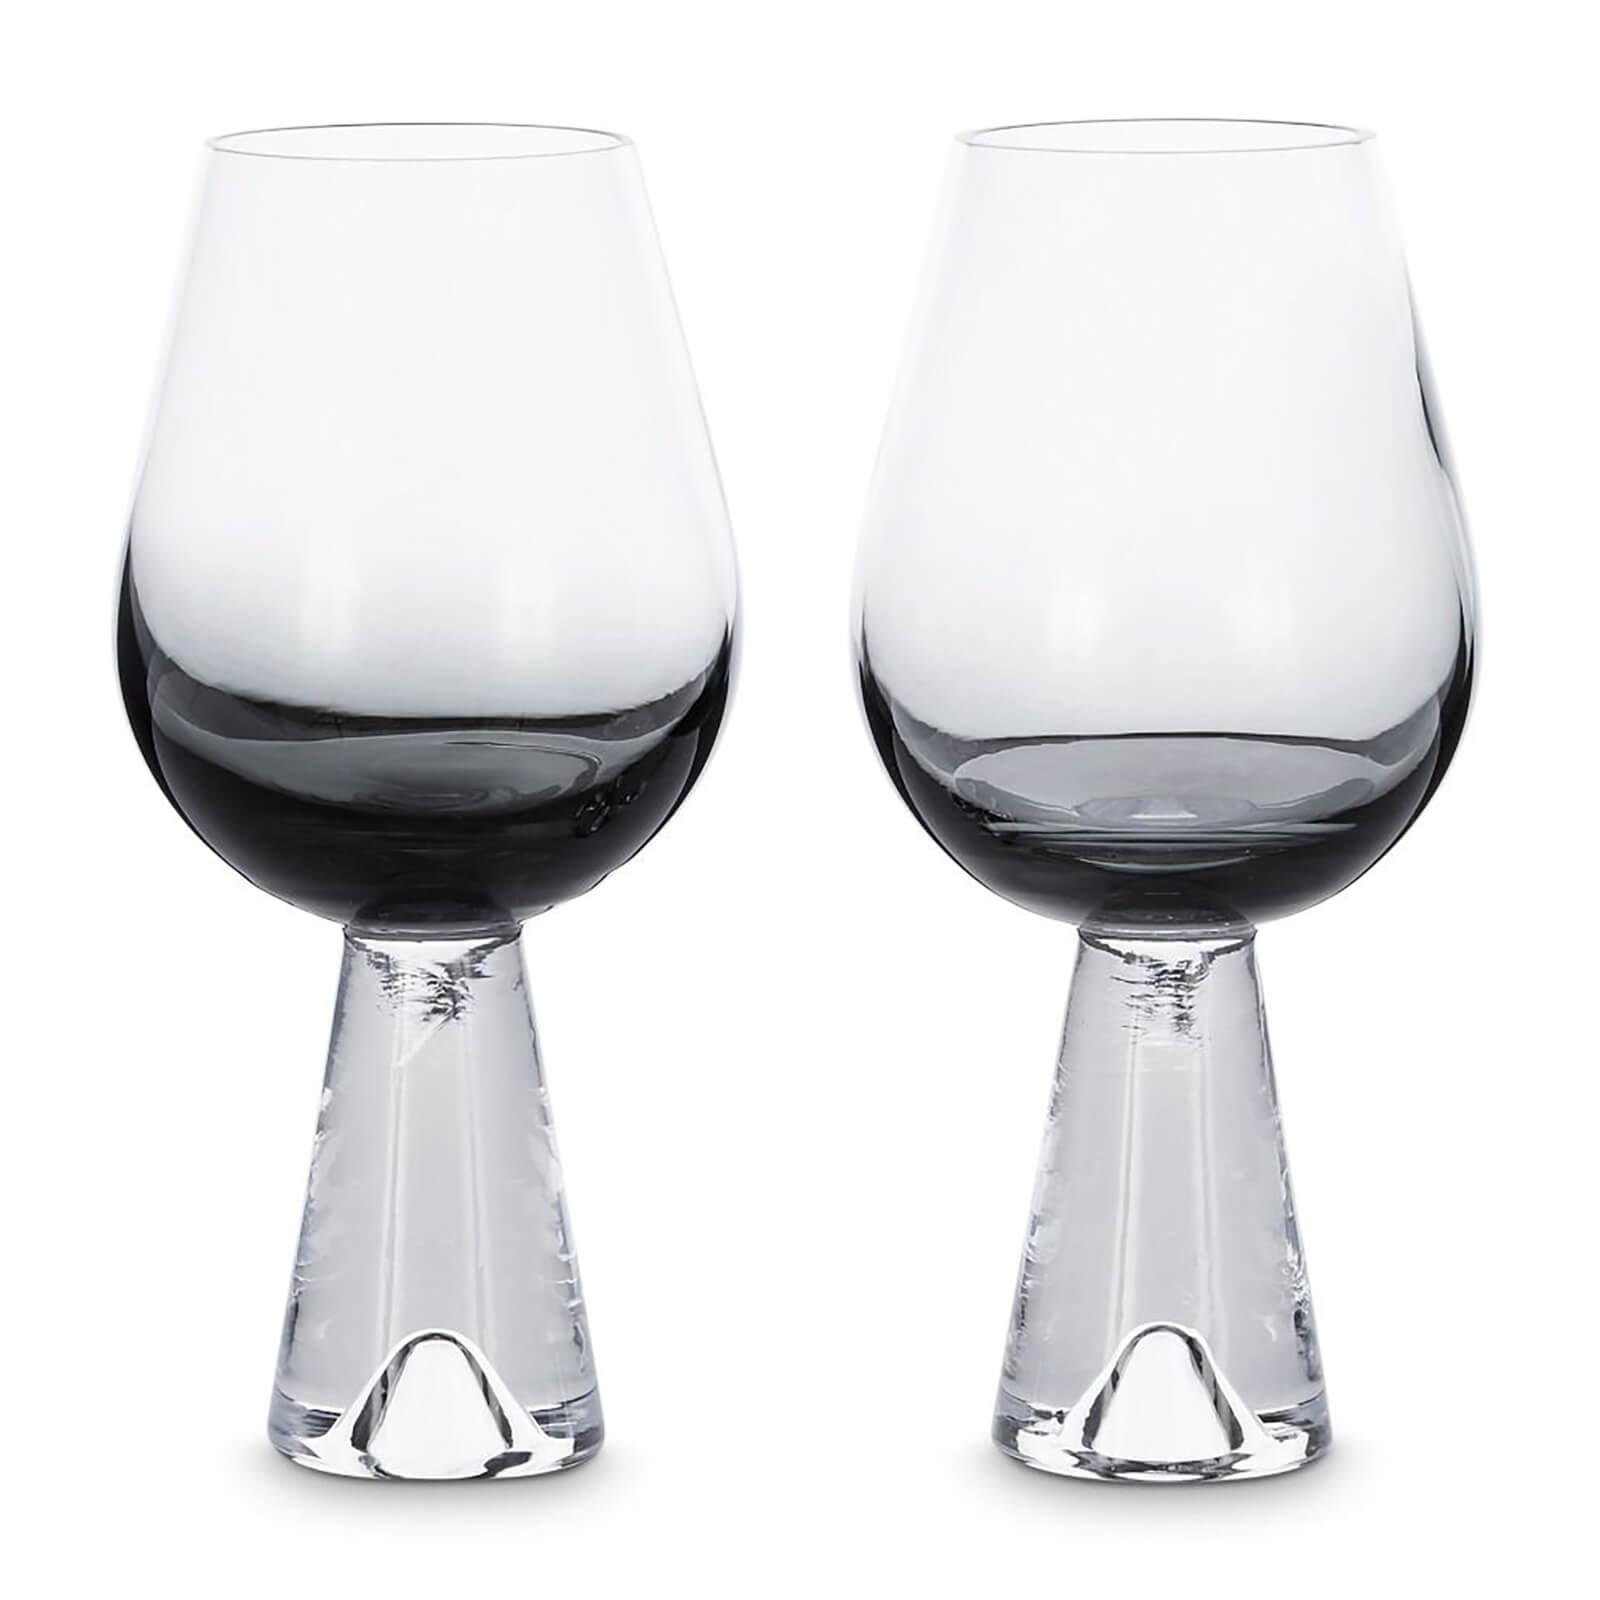 Tom Dixon Tank Wine Glasses - Black